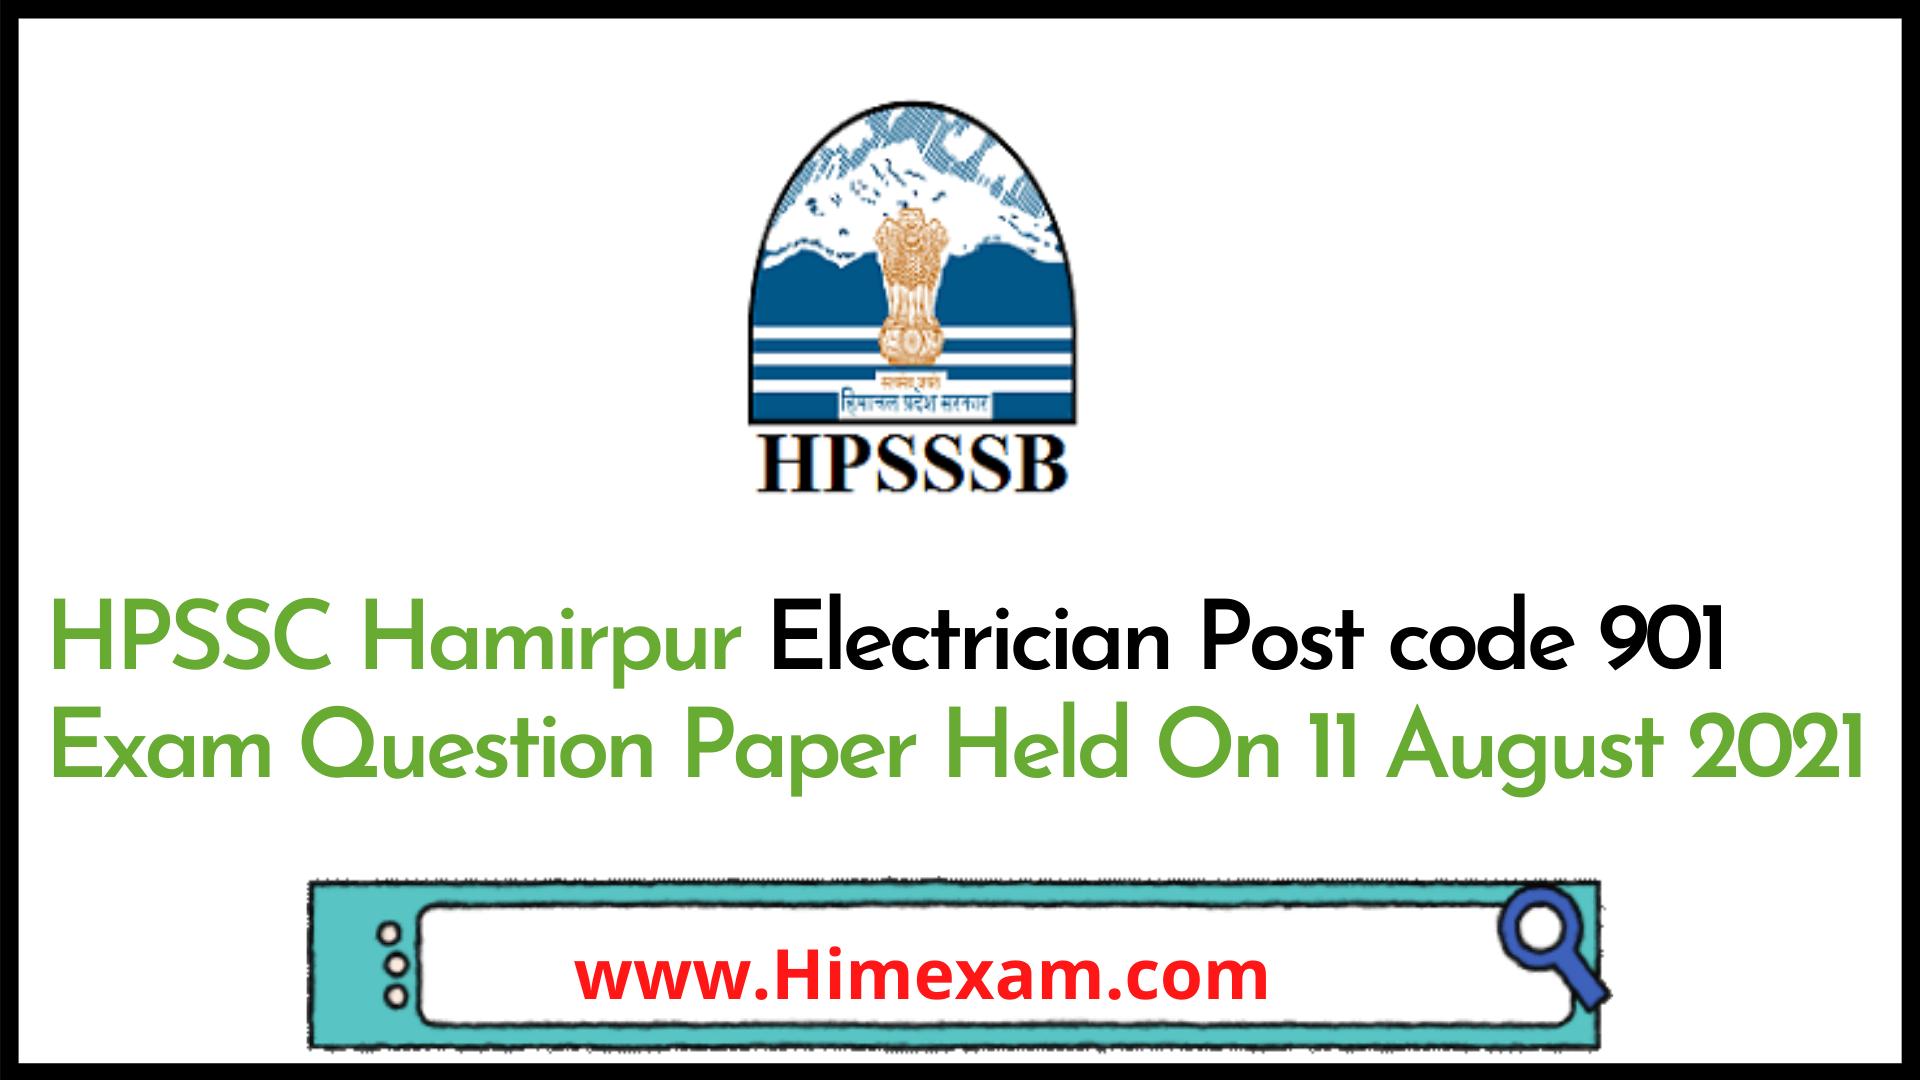 HPSSC Hamirpur  Electrician  Post code 901 Exam Question Paper Held On 11 August 2021